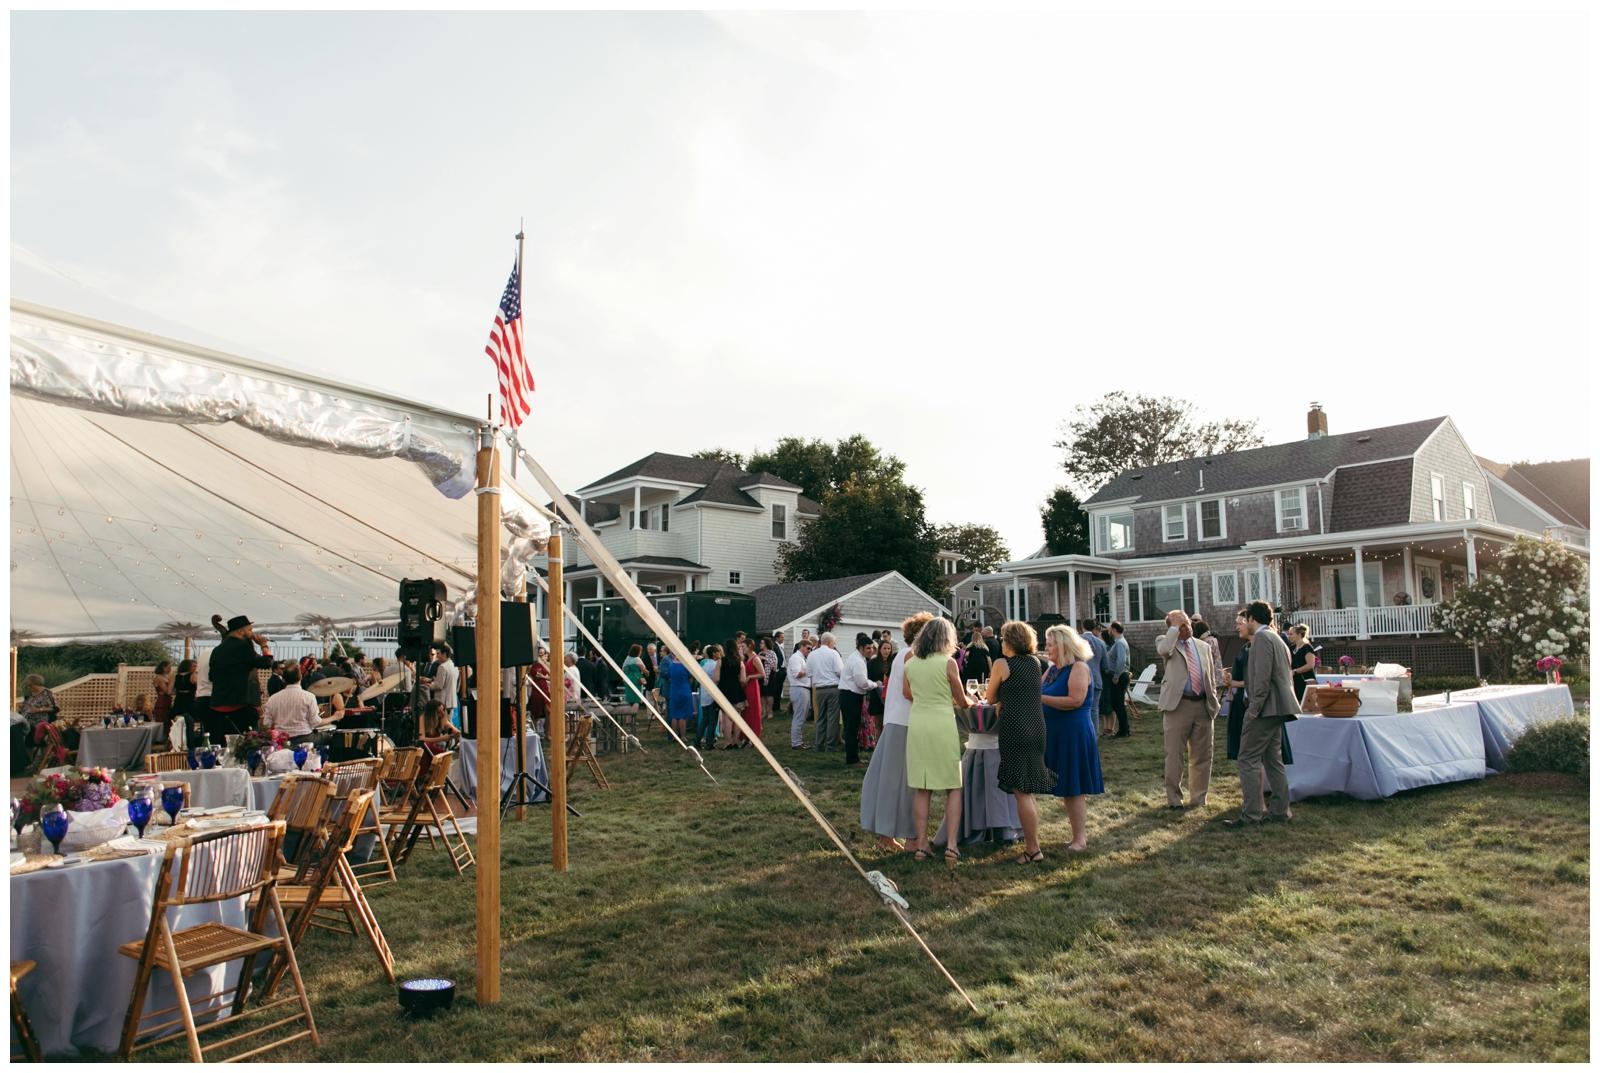 Bailey-Q-Photo-Backyard-Wedding-South-Shore-Boston-Wedding-Photographer-074.jpg